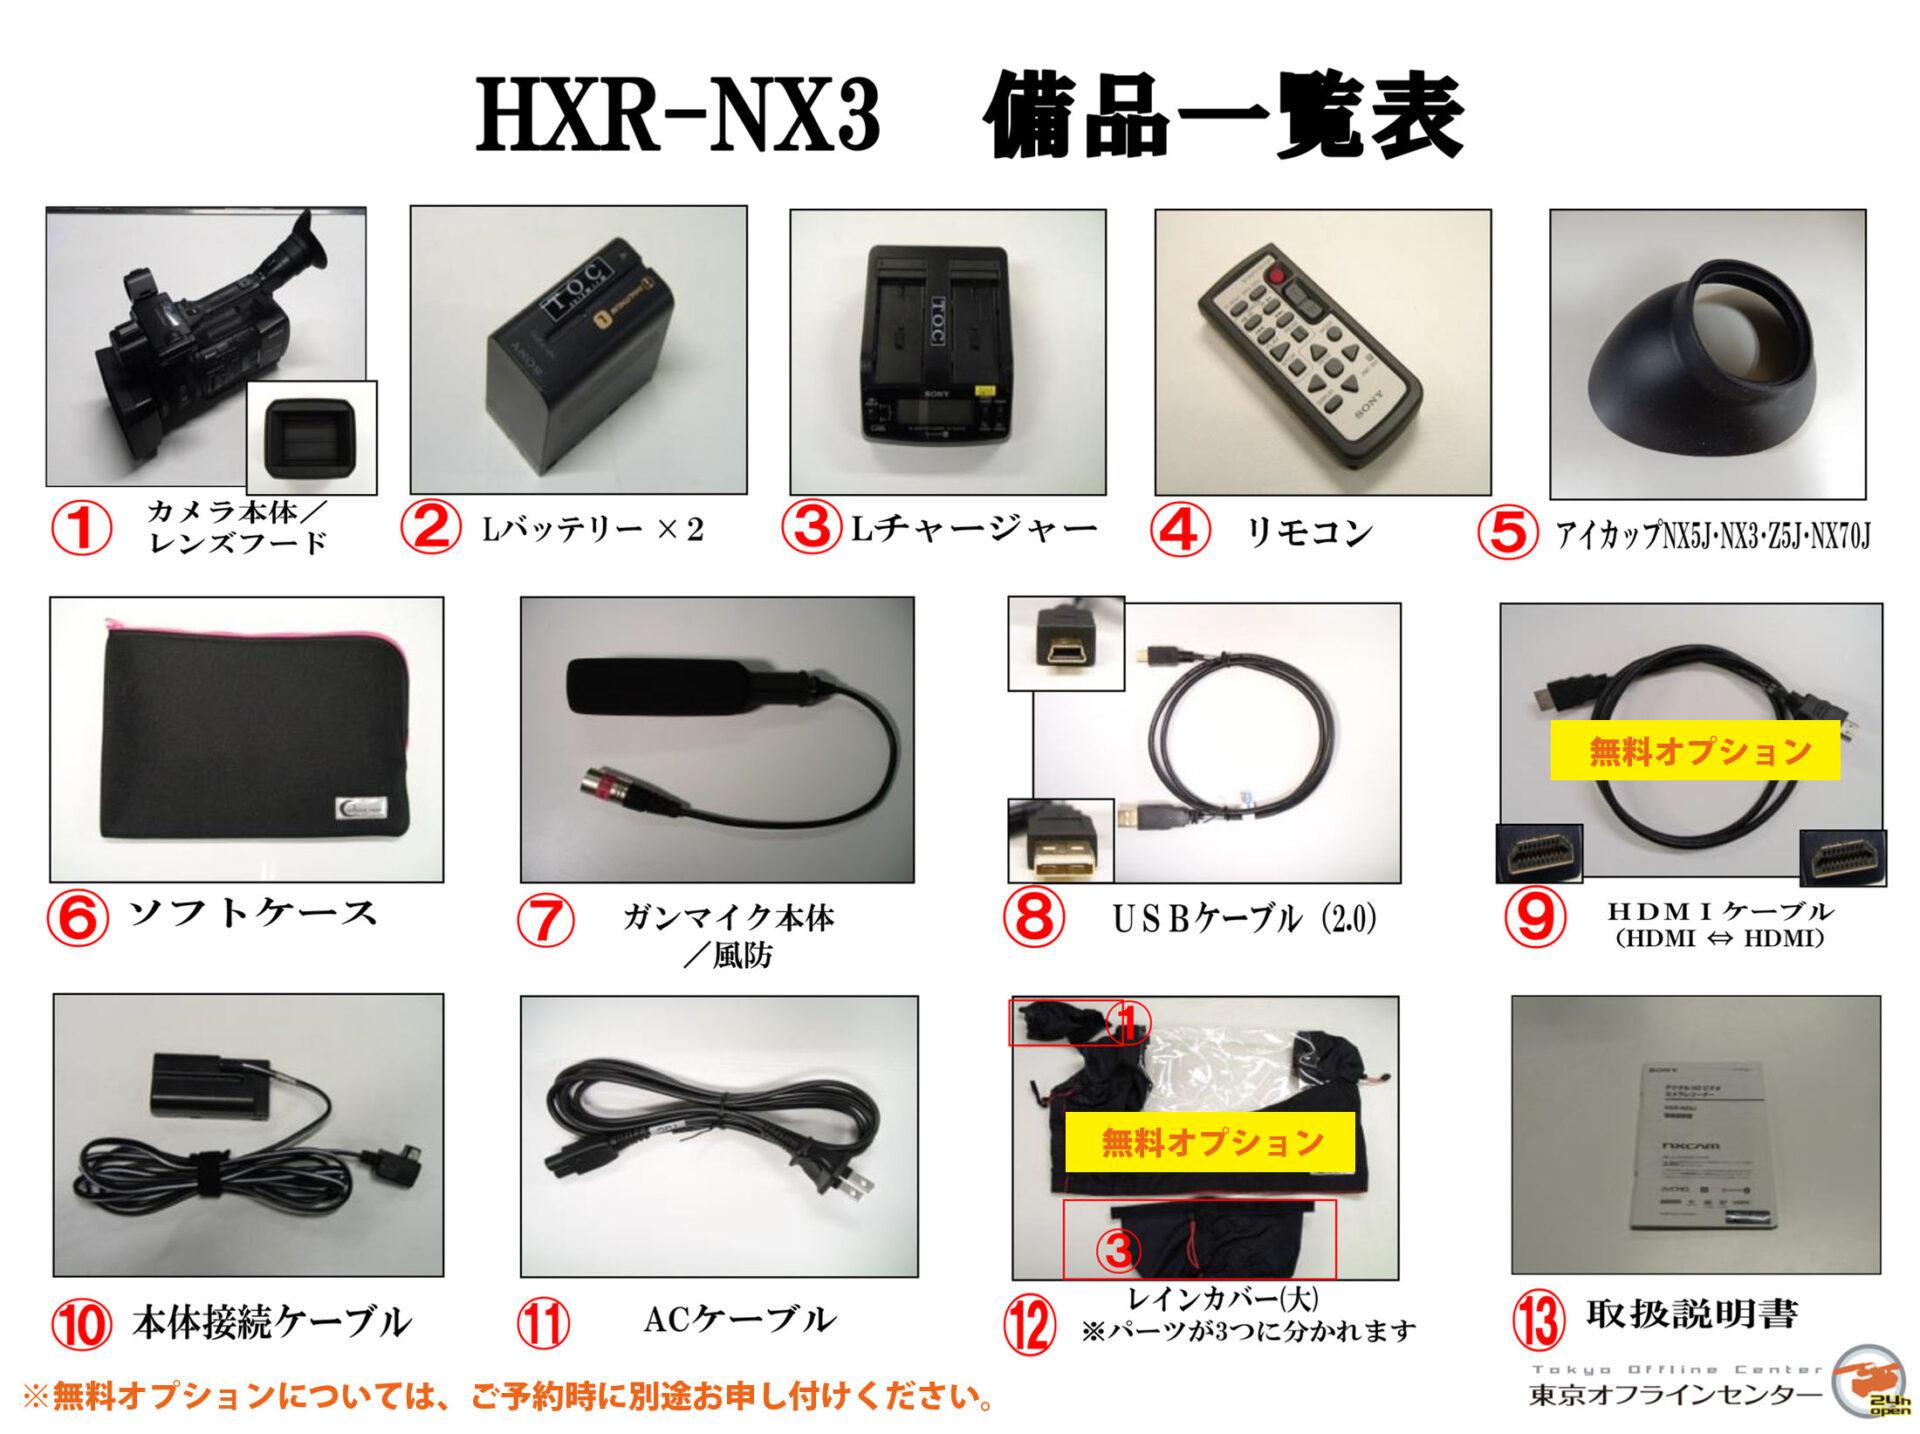 SONY HXR-NX3 備品一覧表